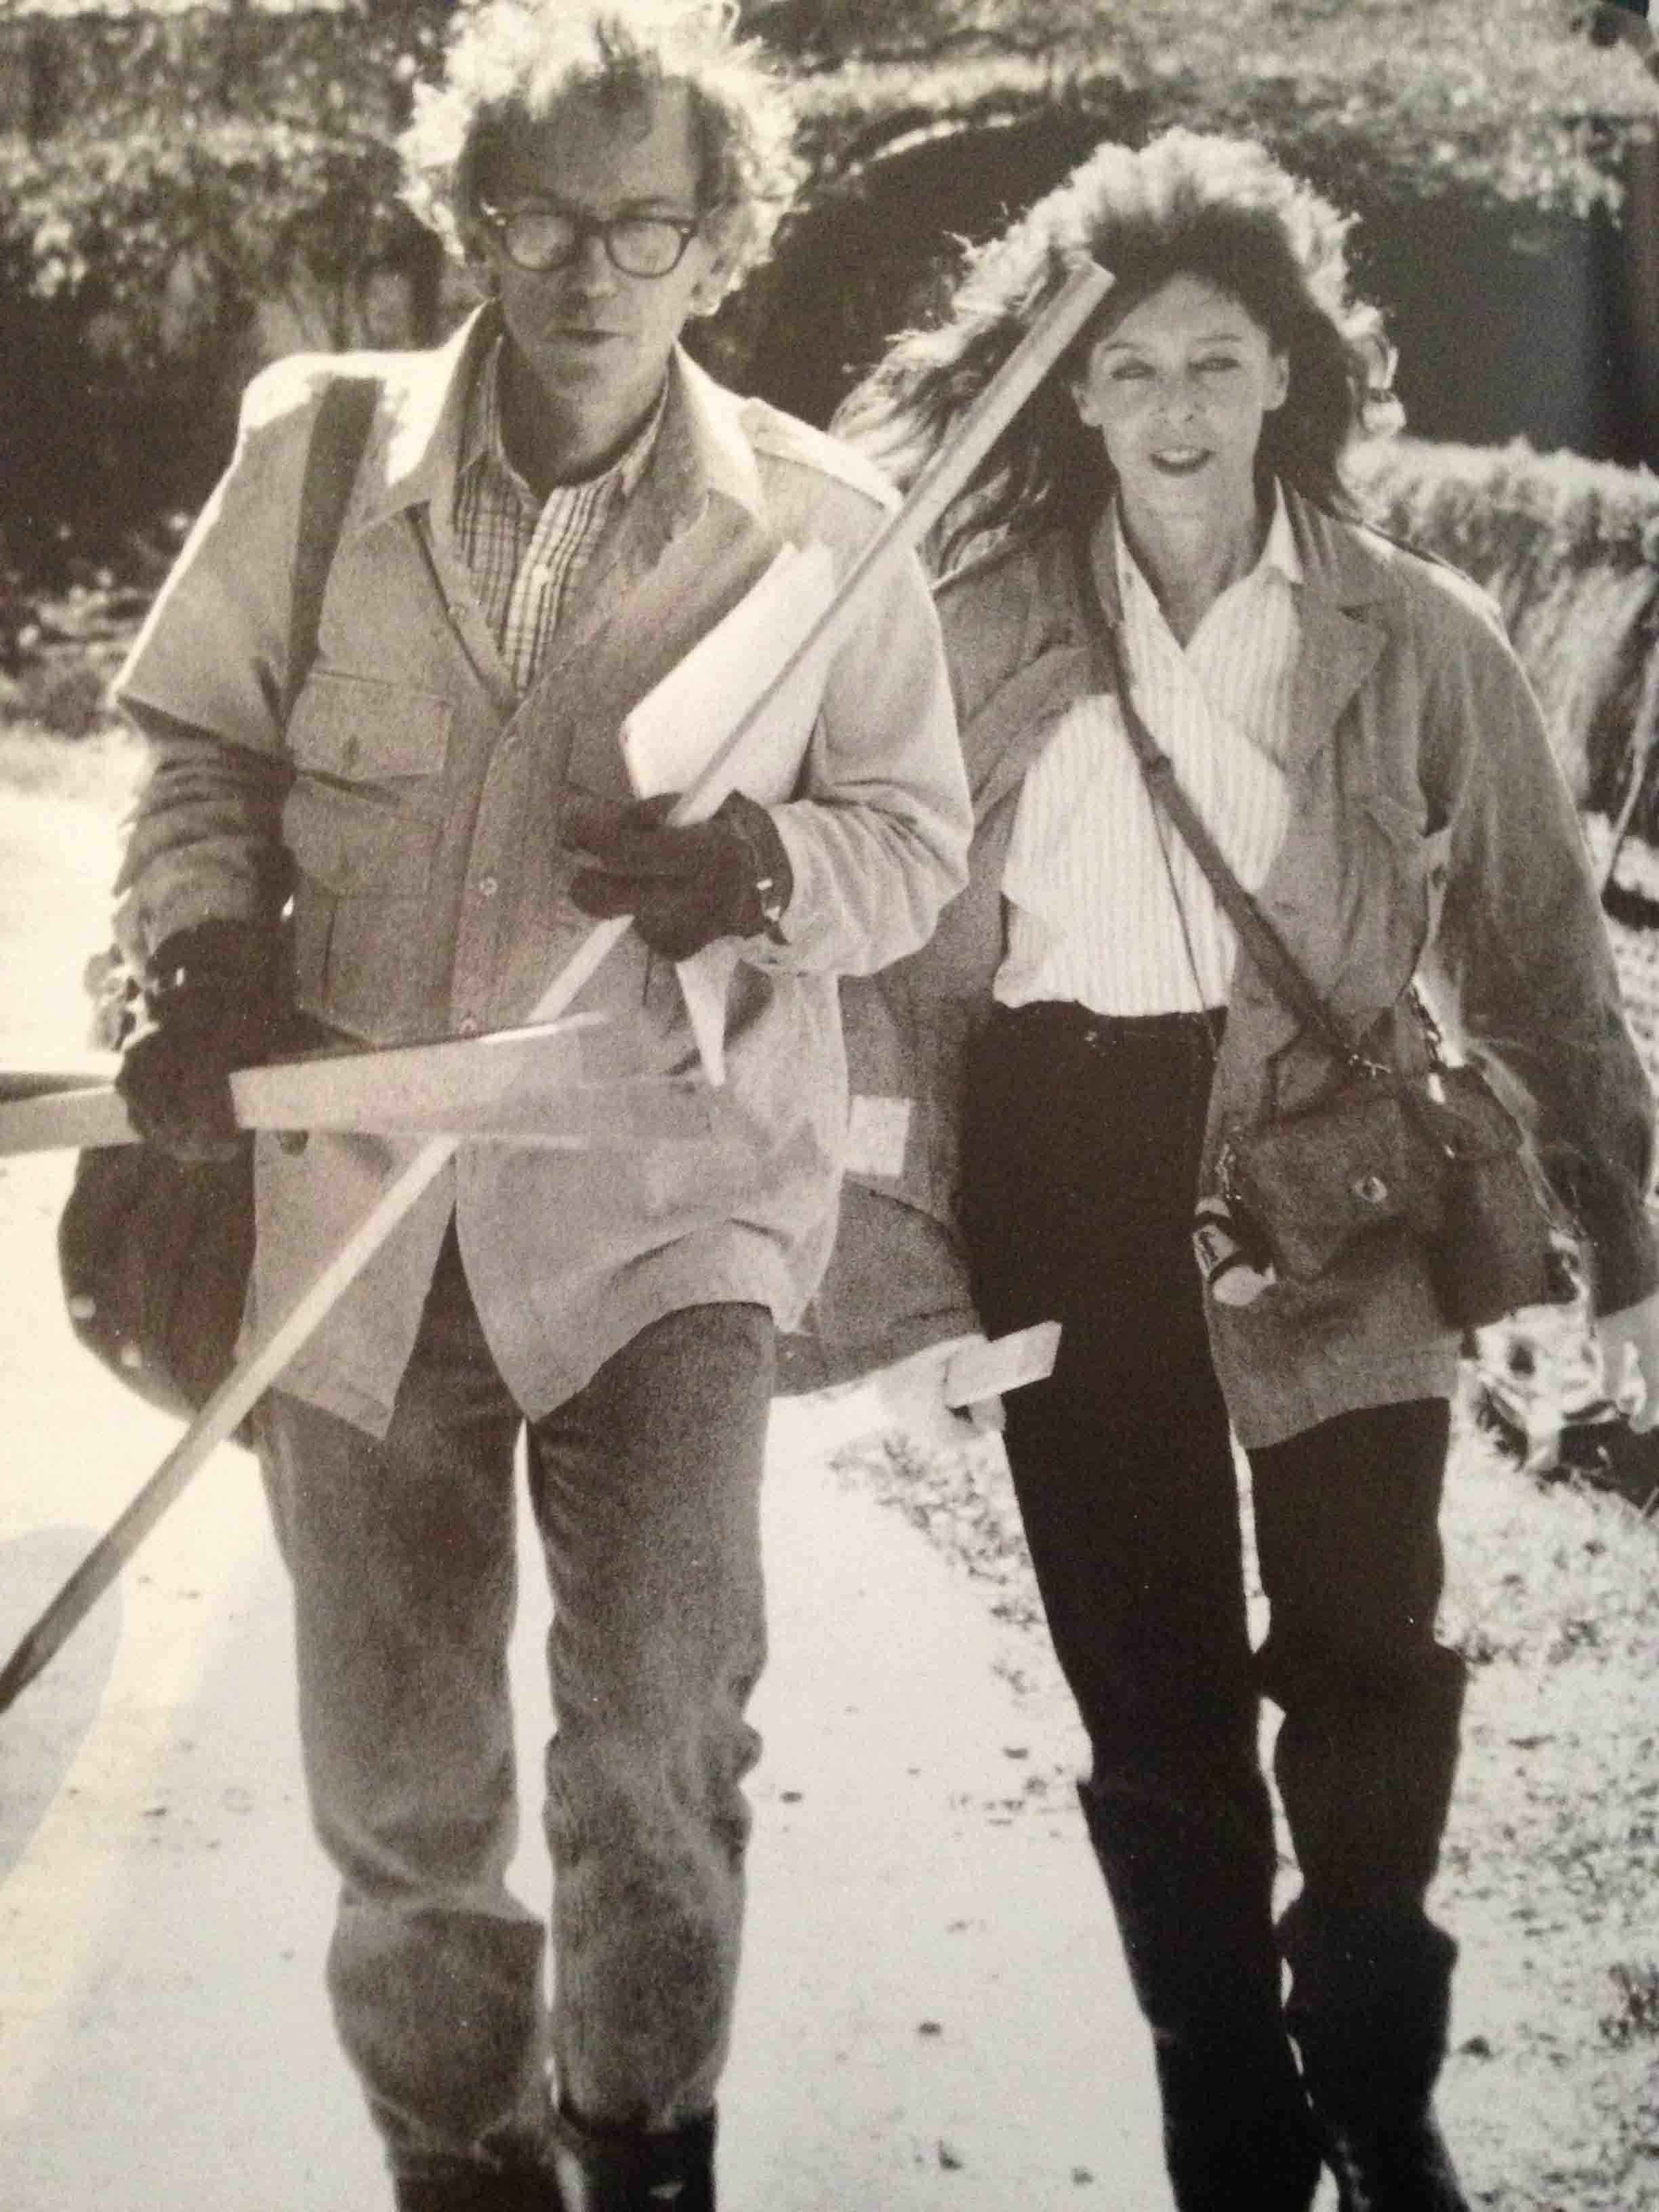 Christo and Jeanne-Claude working on The Umbrellas, Japan-USA in Ibaraki, Japan, 1988.